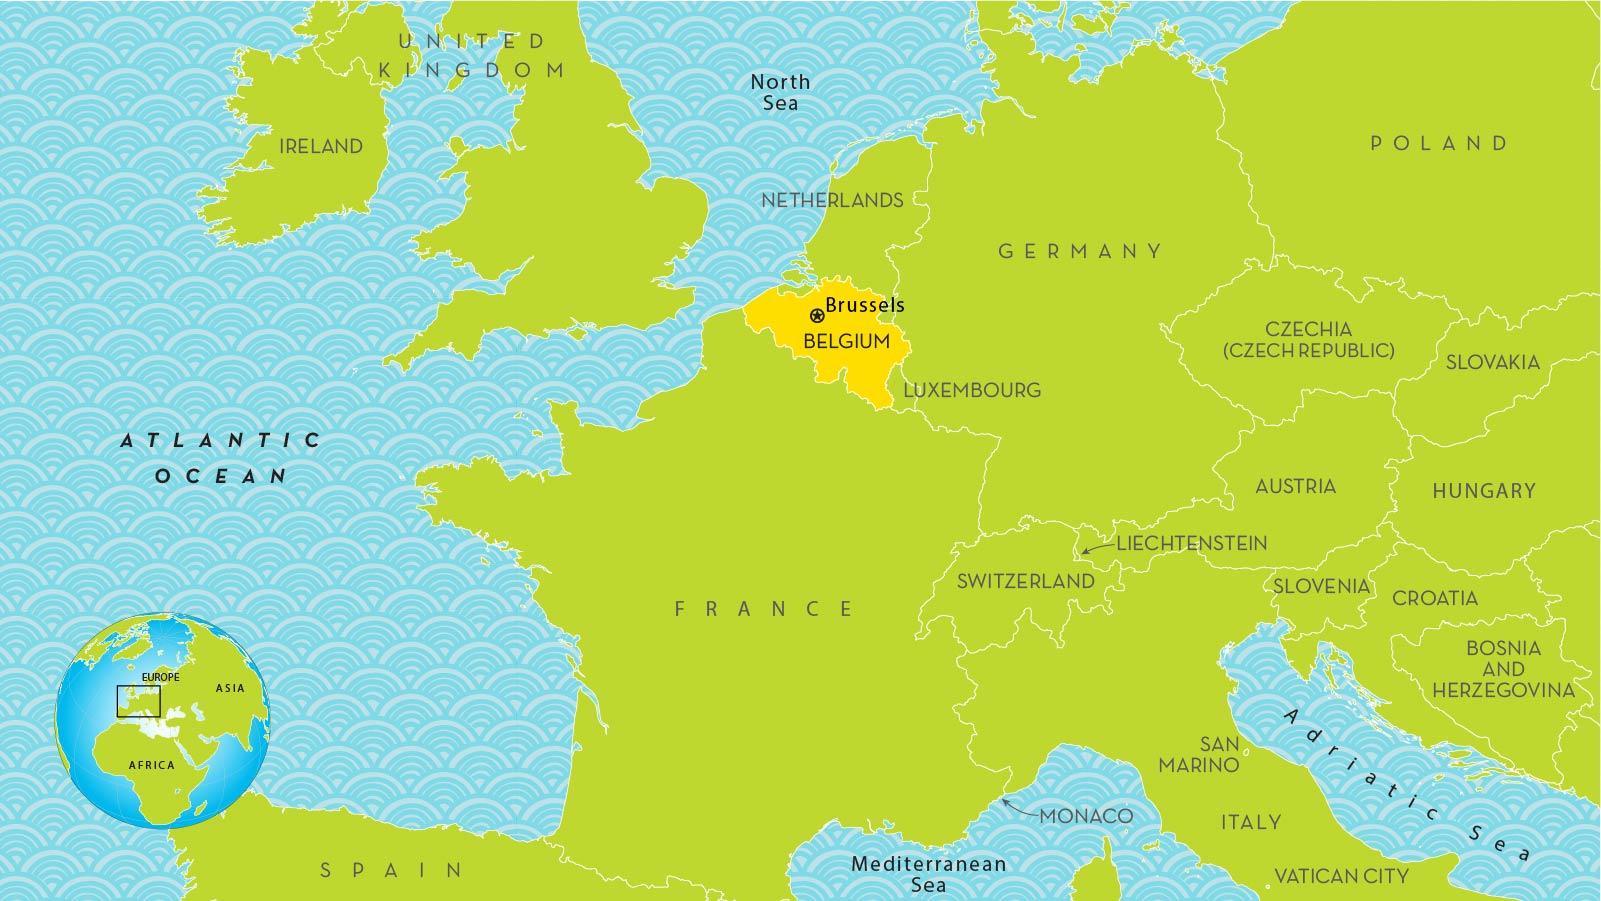 Bruxelles, belgique carte europe - Carte de Bruxelles en europe (Belgique)